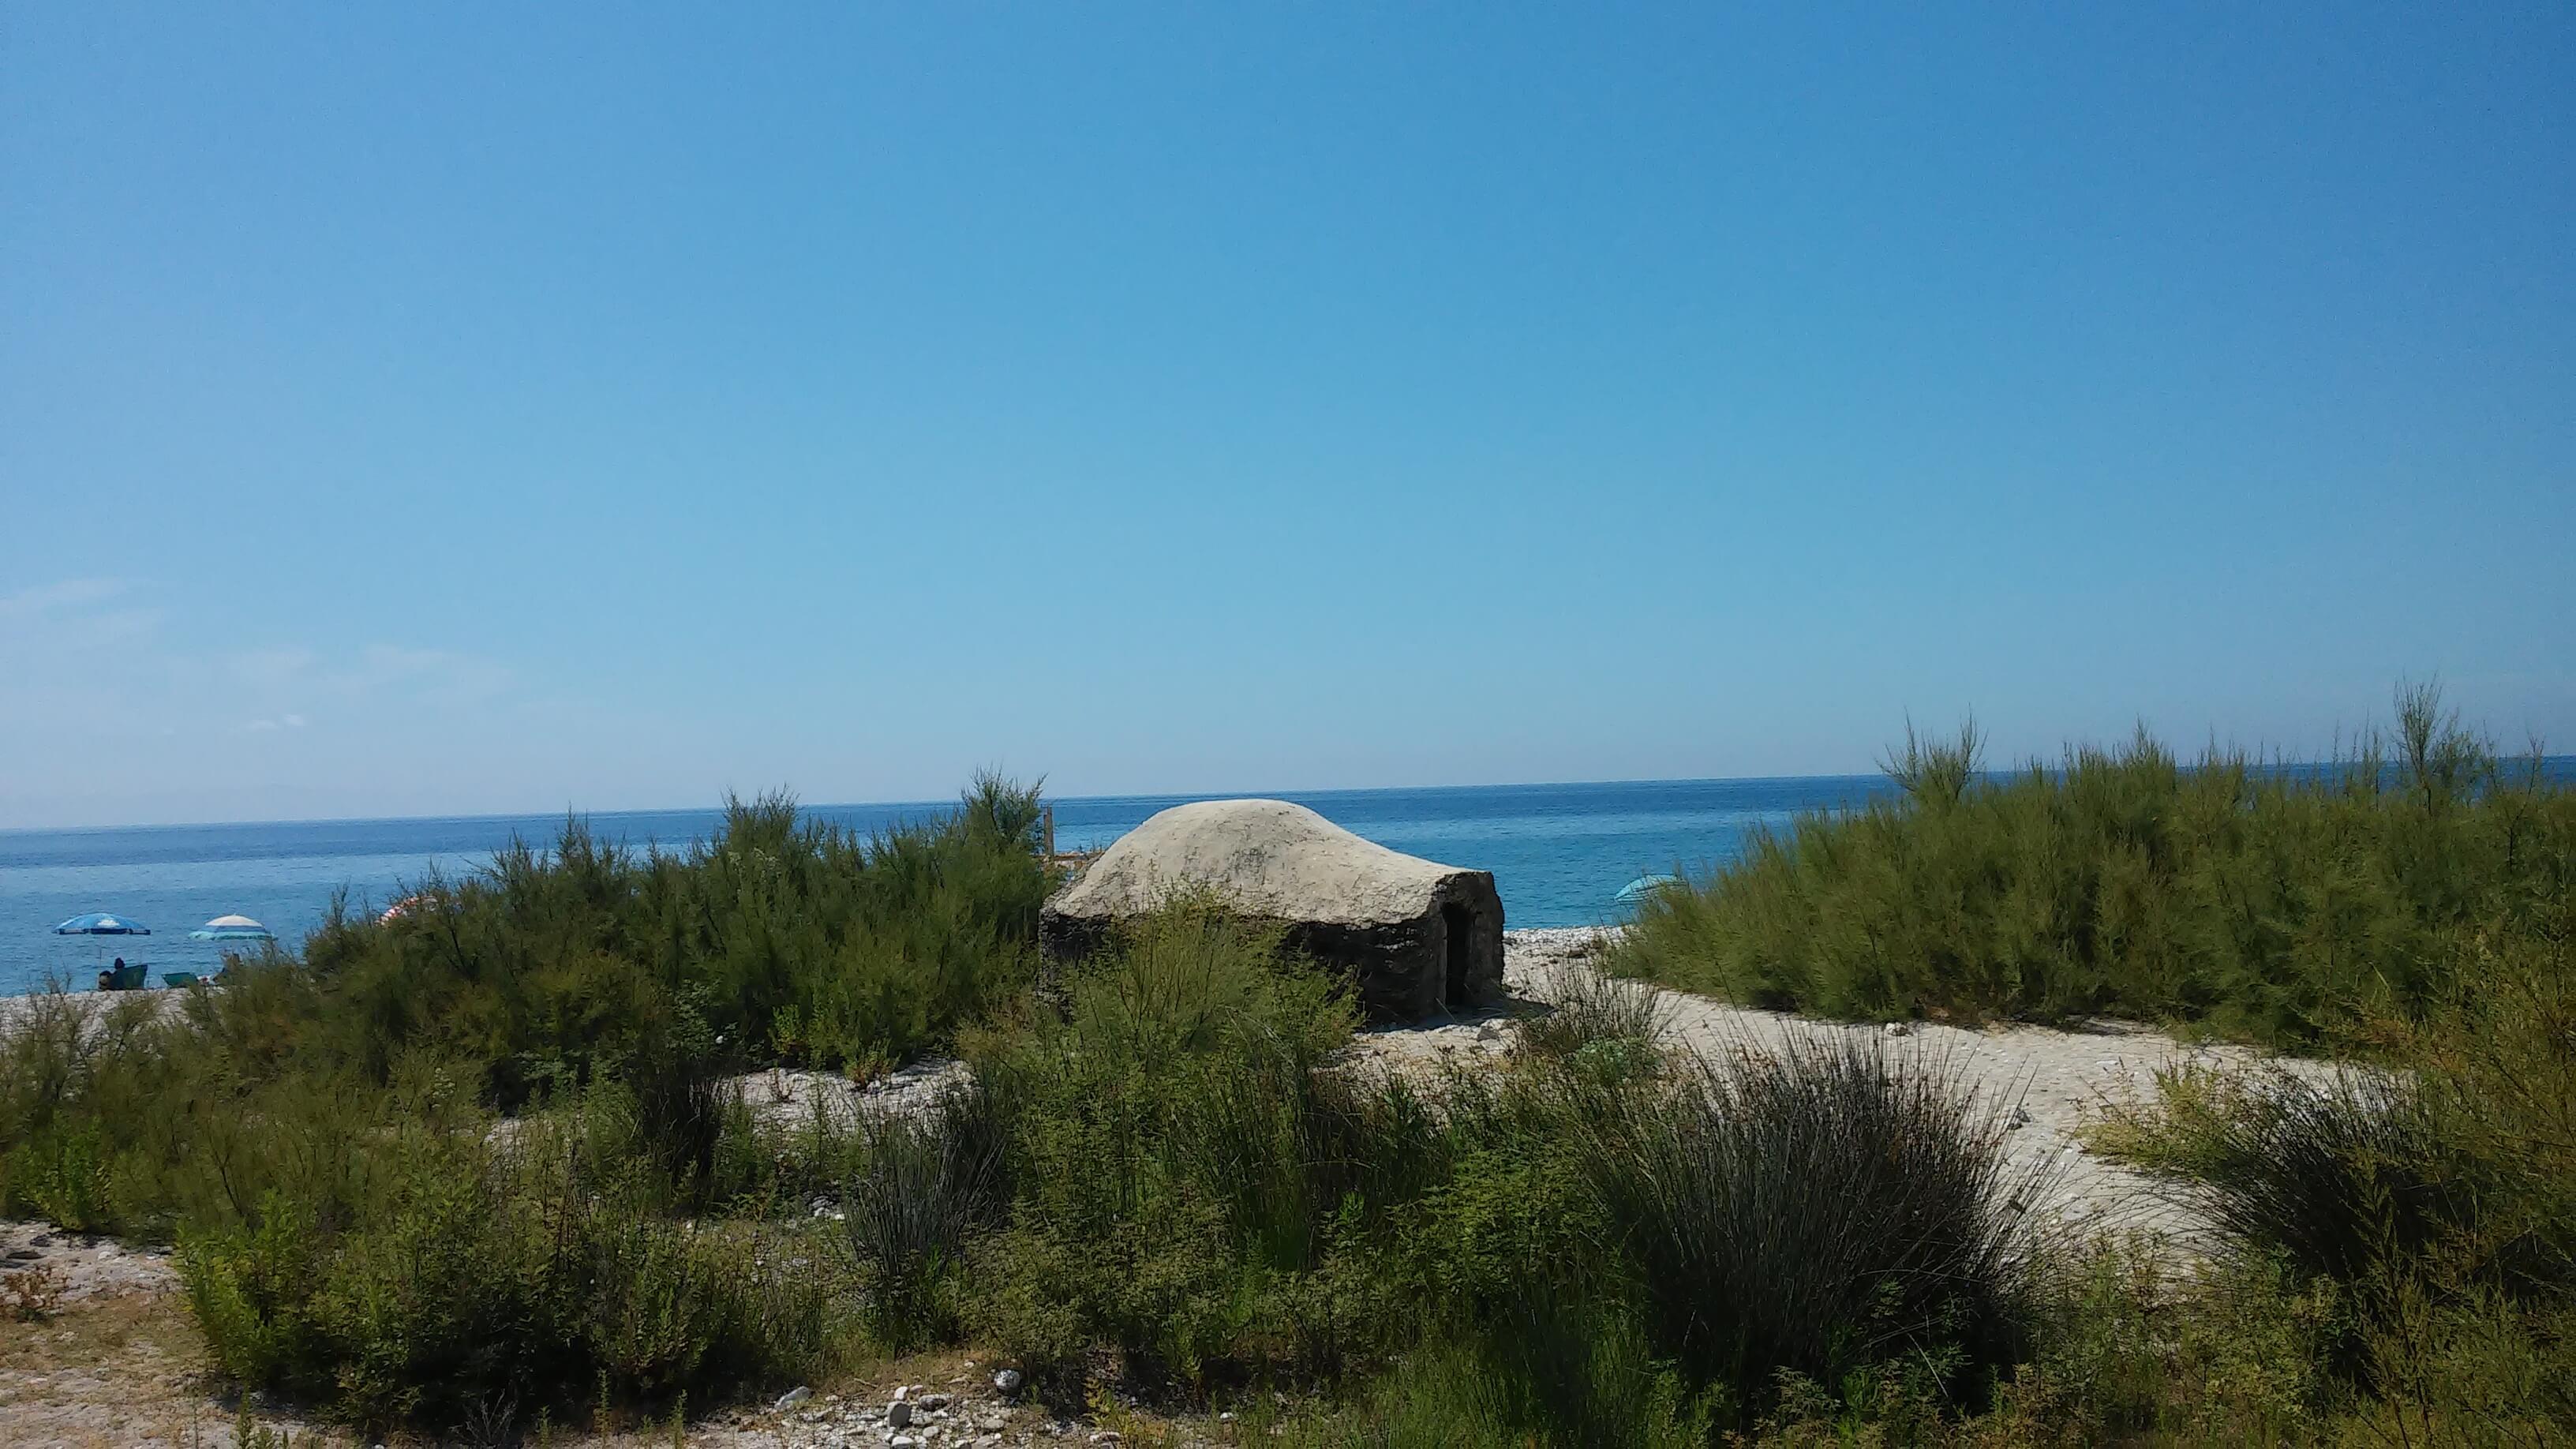 Spiaggia Borsh Albania bunker